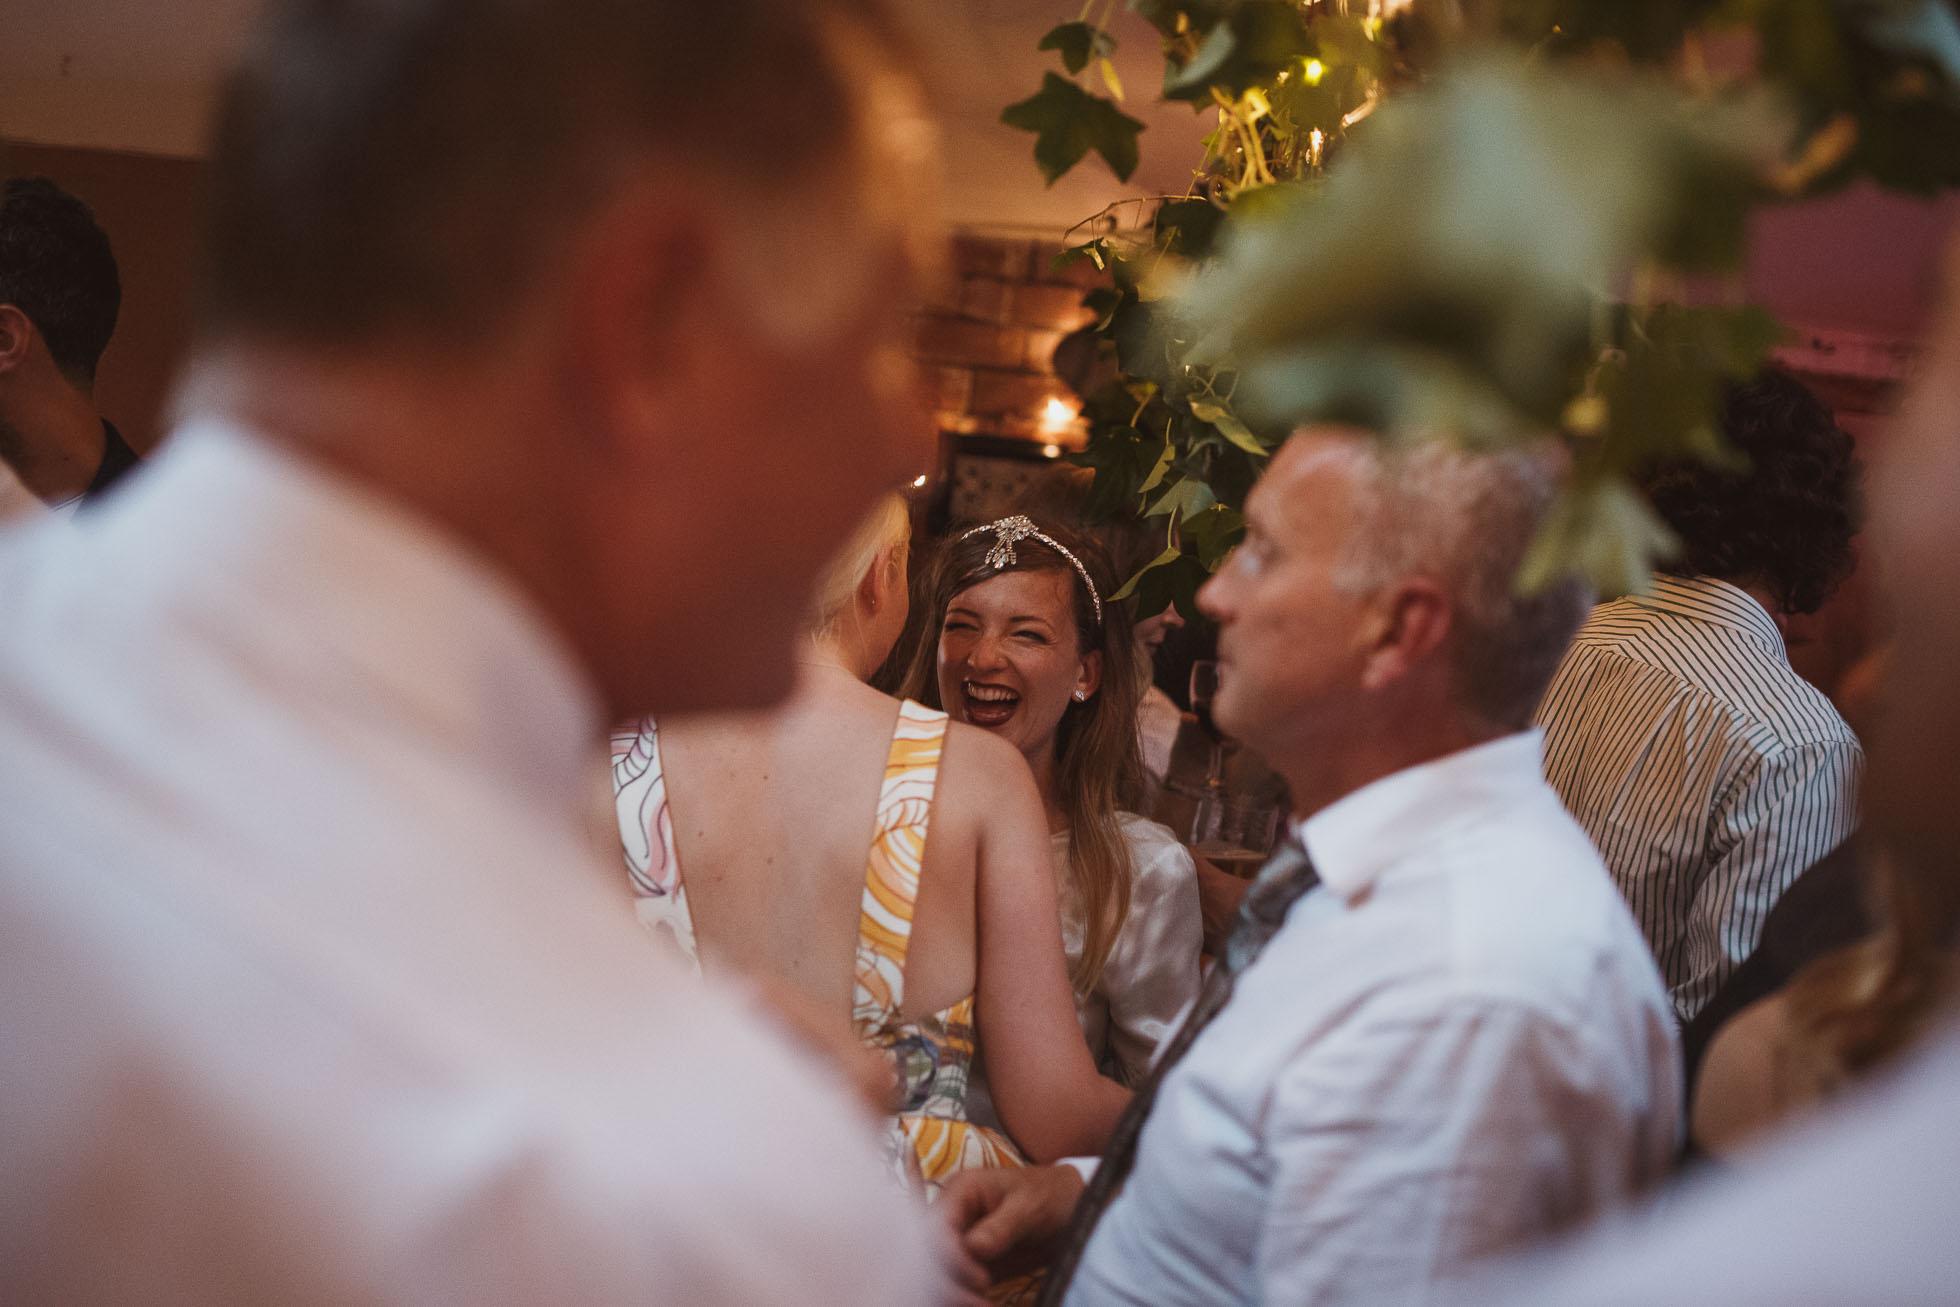 sheffield-botanical-gardens-wedding-photographer-107.jpg